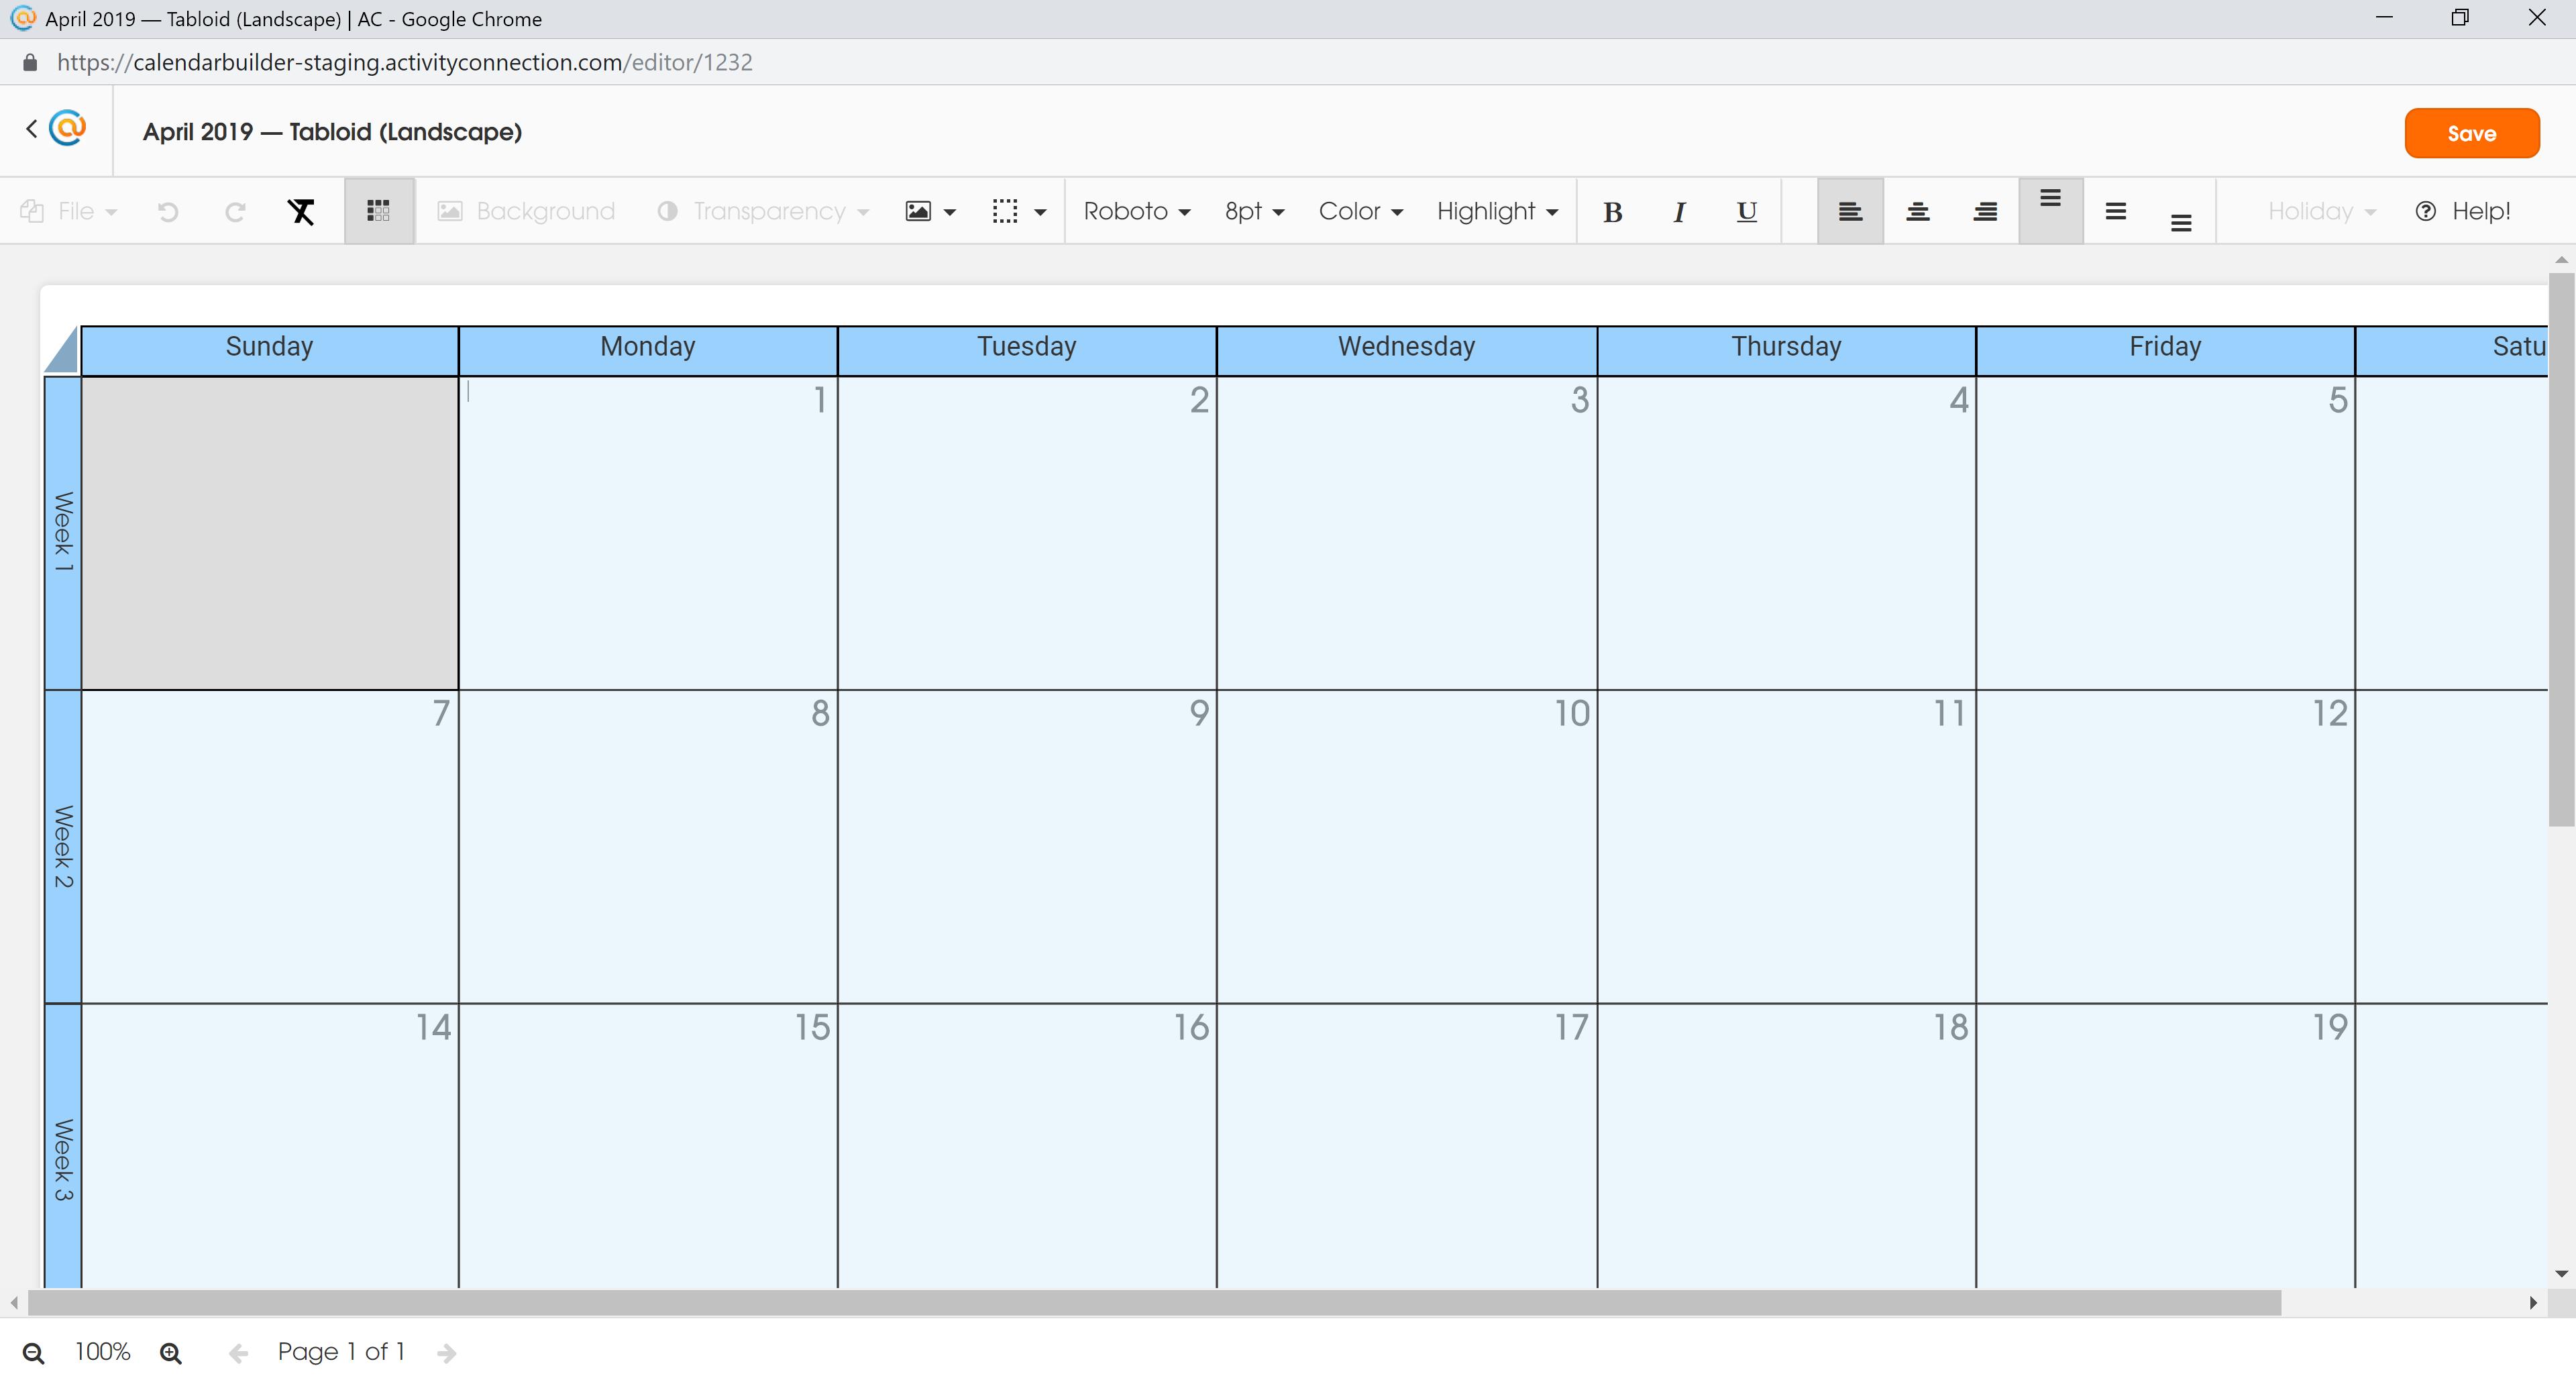 Calendar - All Selected